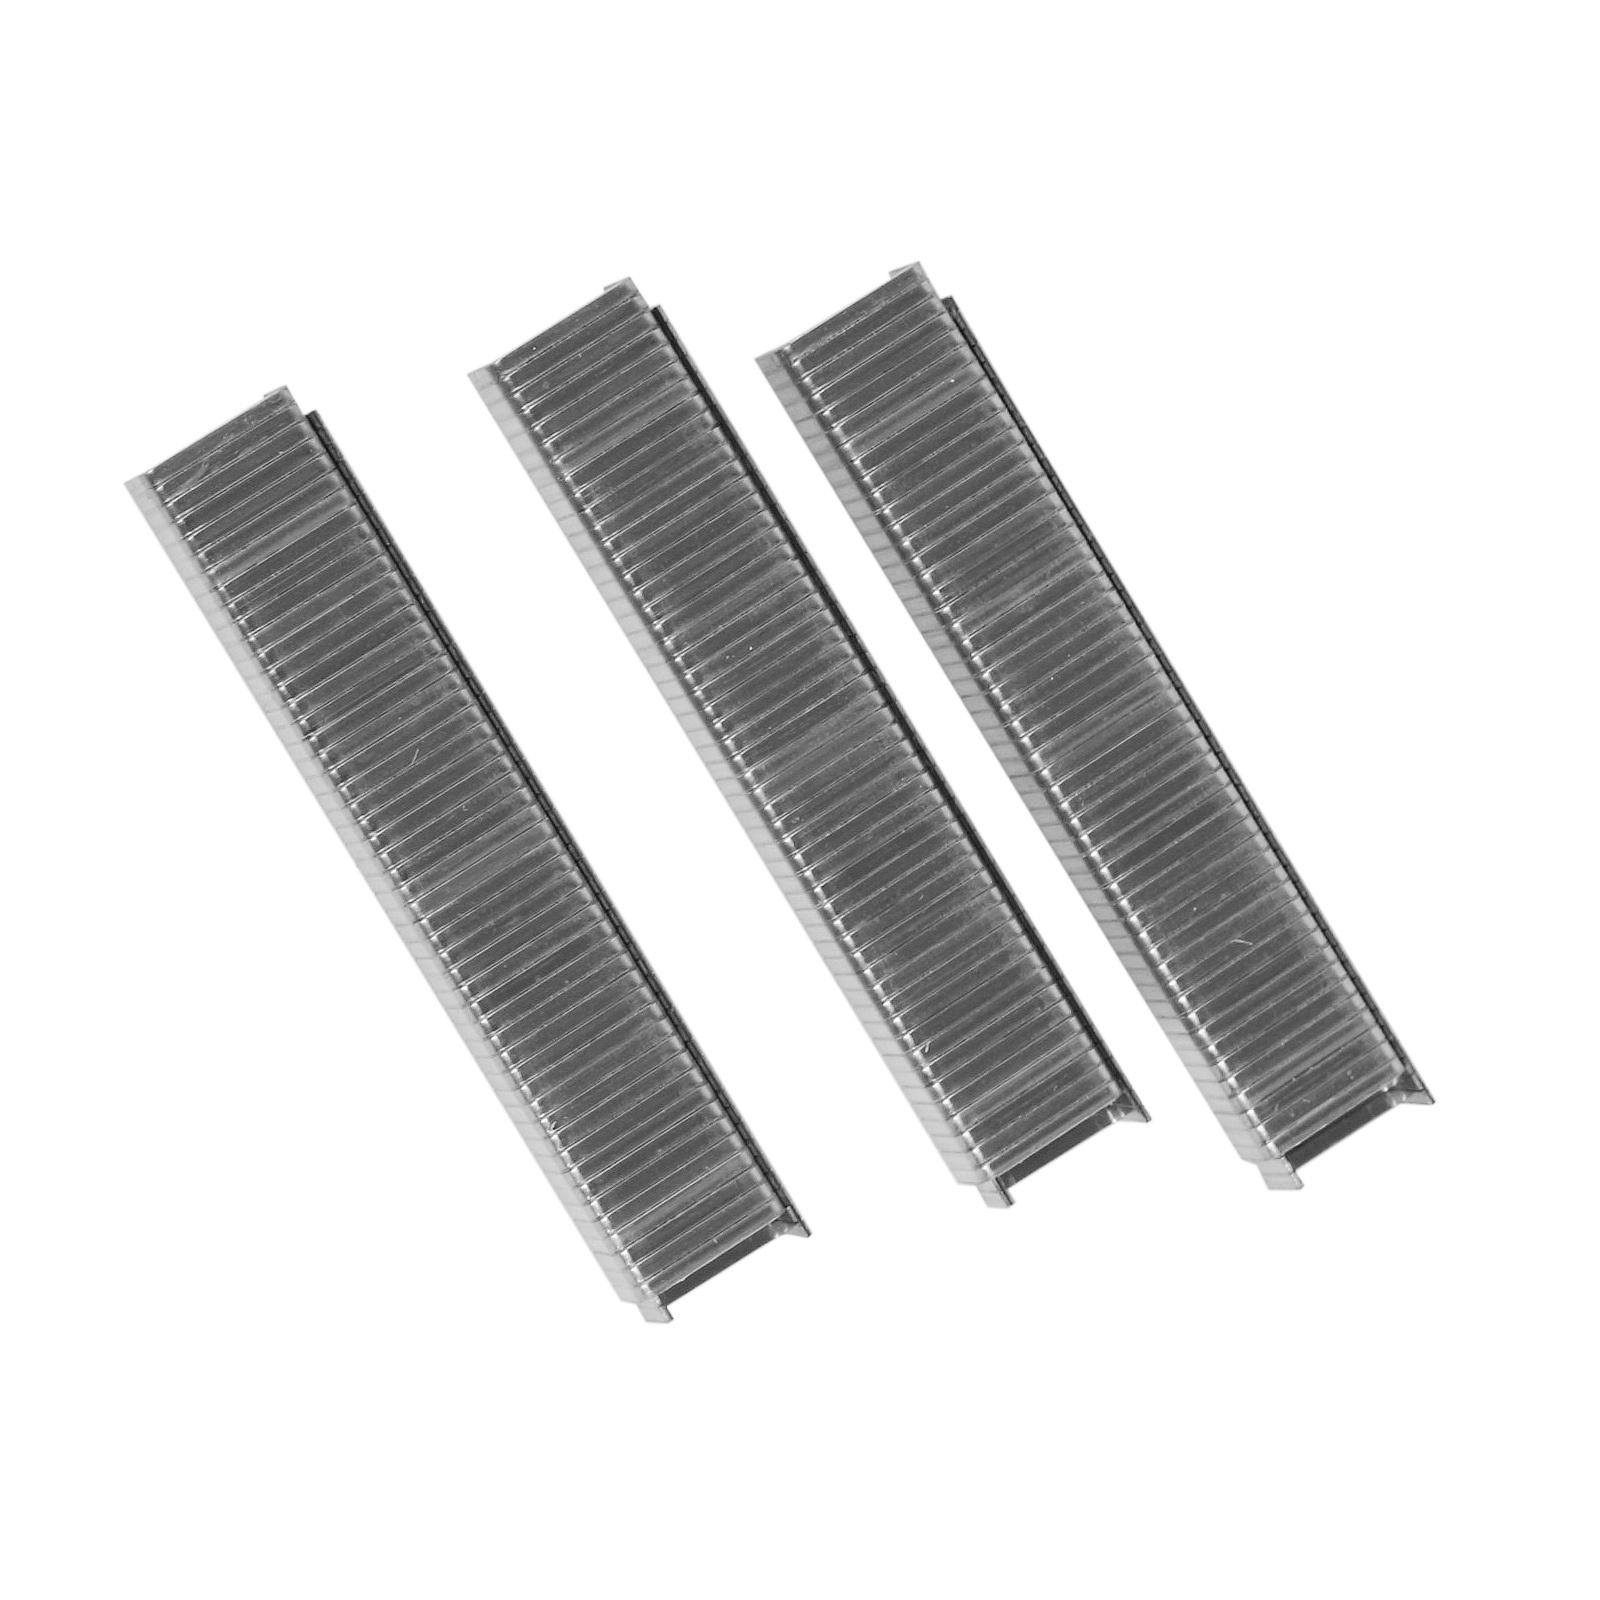 China 10mm Heavy Duty Nails U Shaped Galvanized Staples